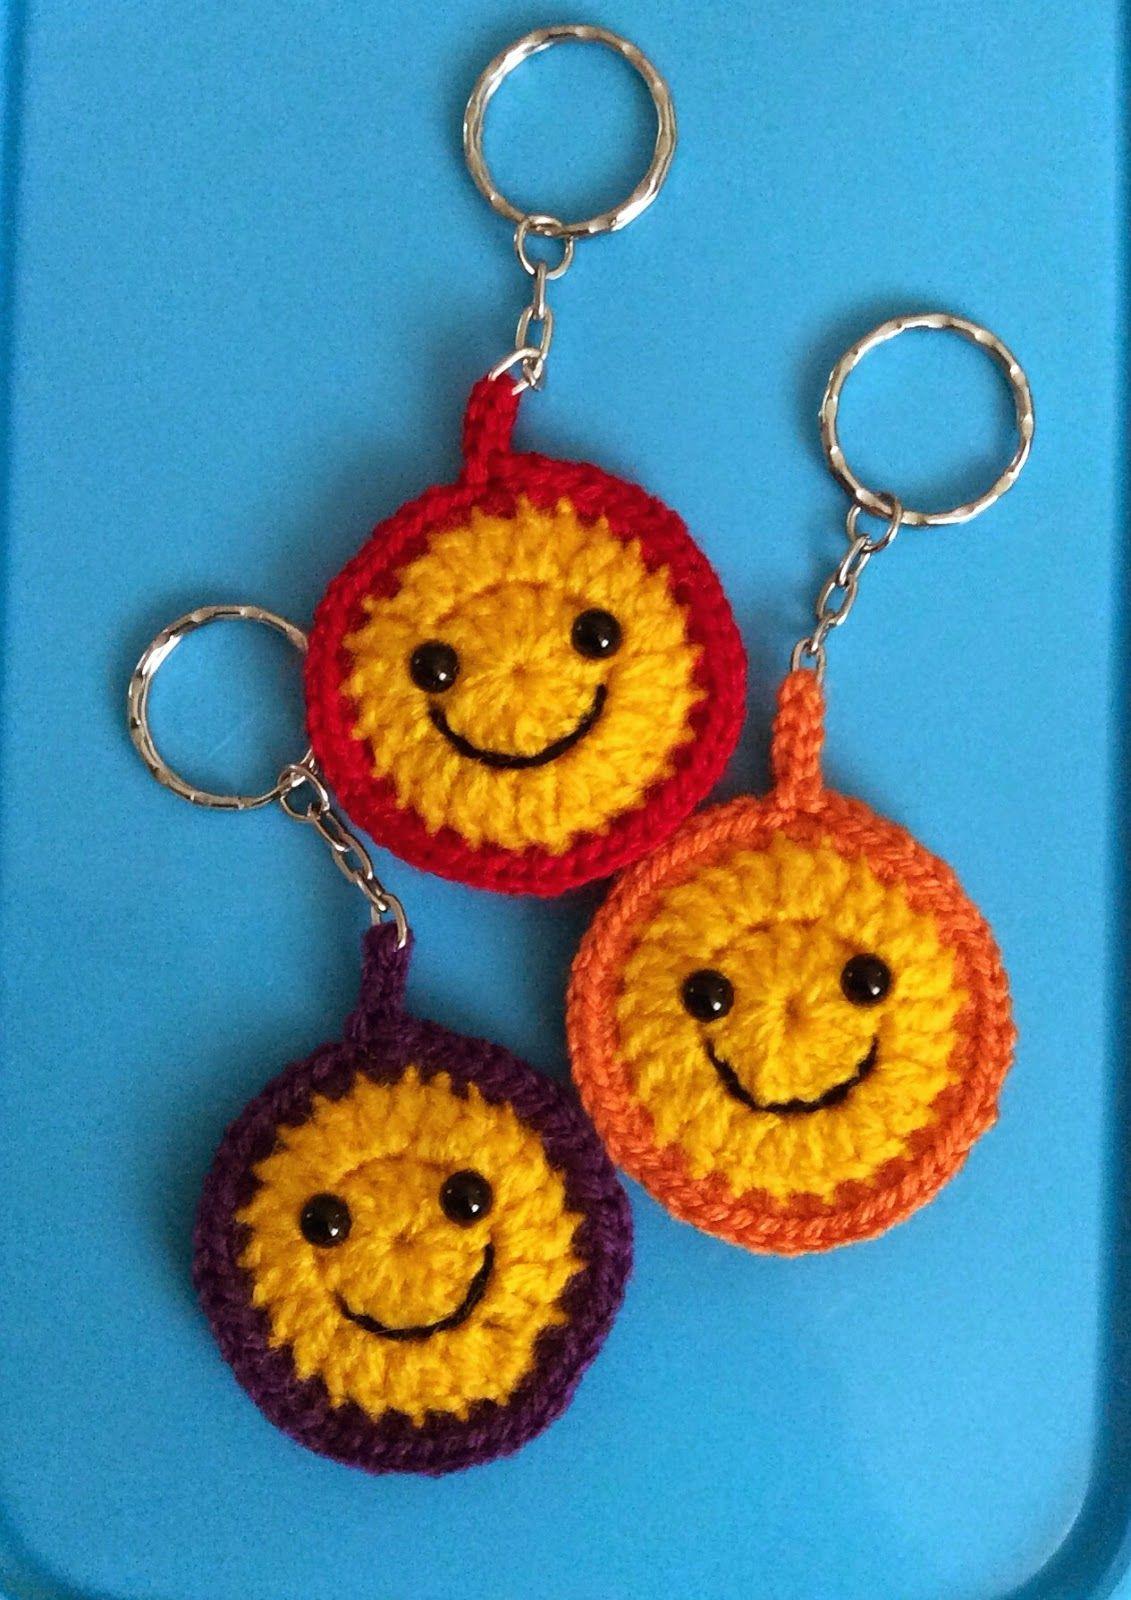 Lonemer Creations: Smiley Keyring Pattern crochet ...